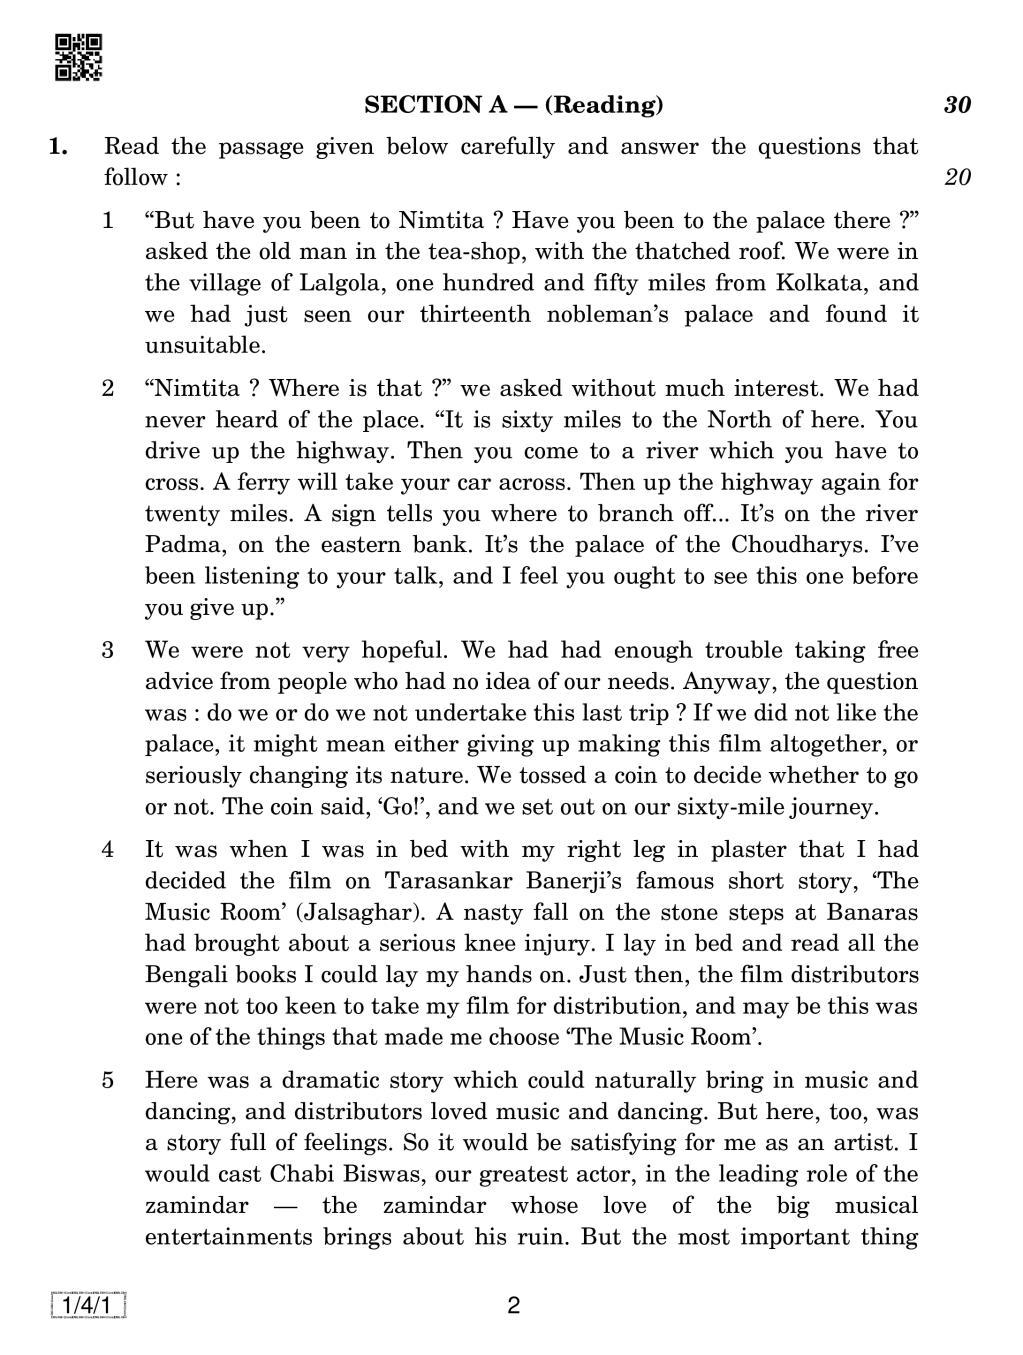 CBSE Class 12 English Core Question Paper 2019 Set 4